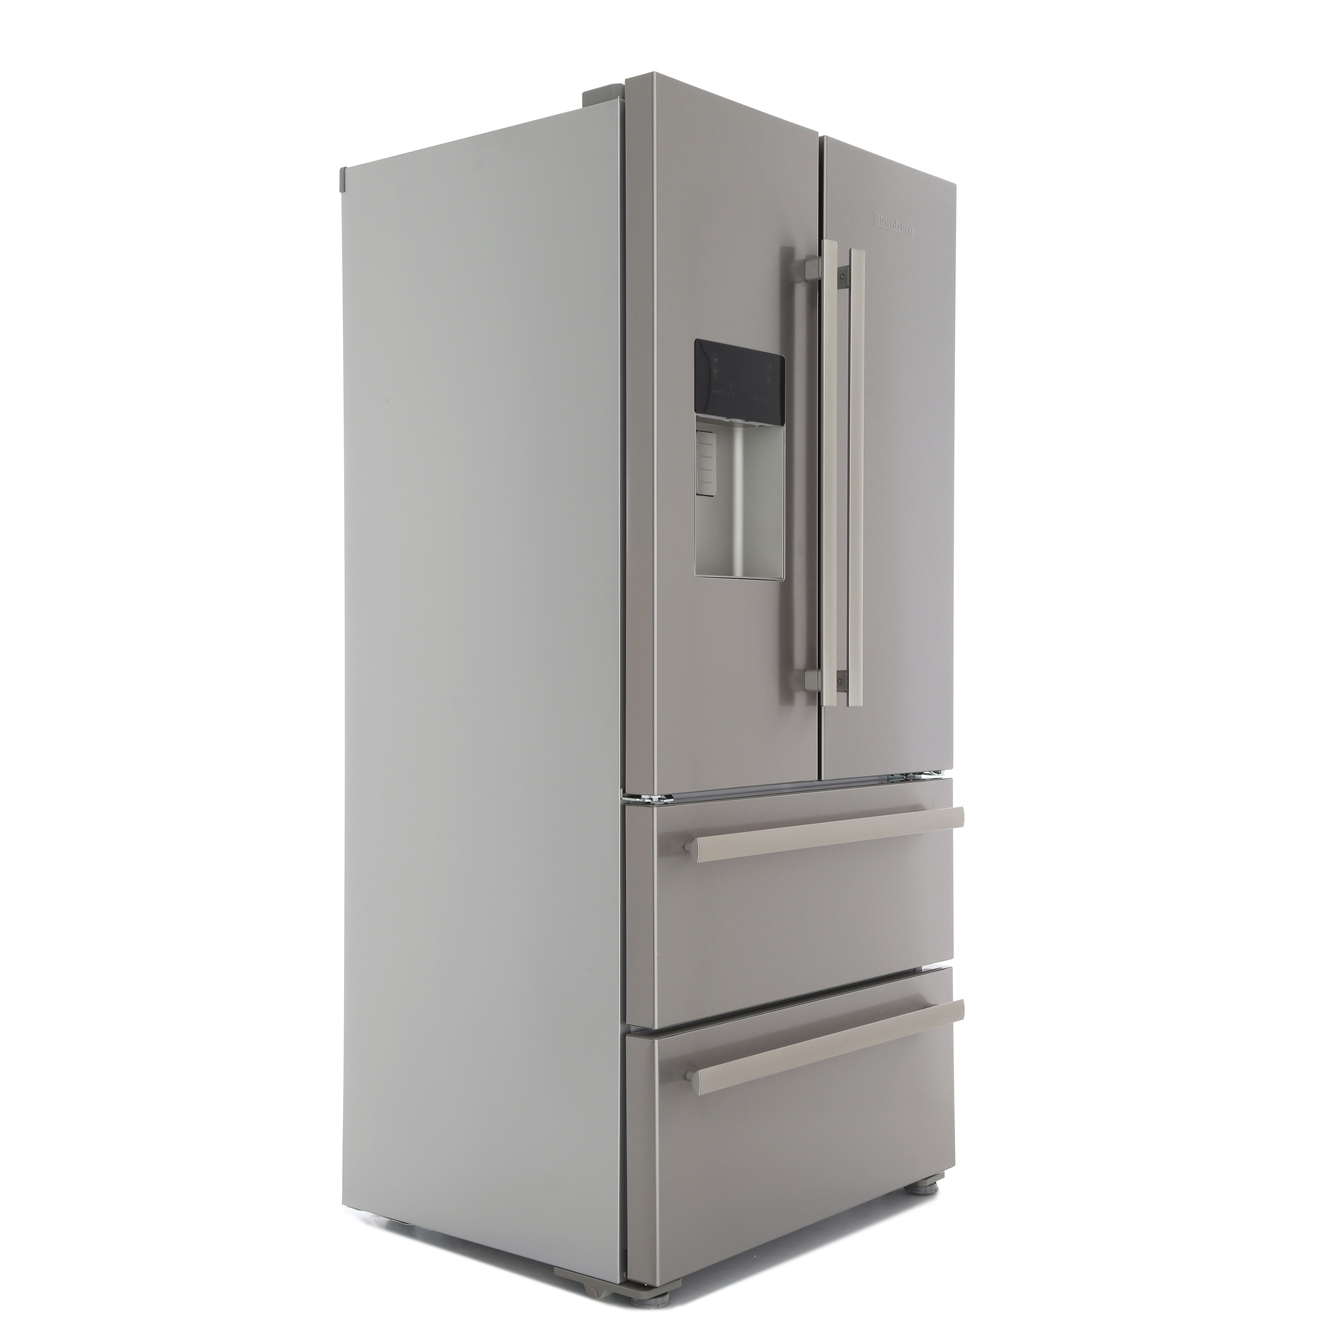 Blomberg KFD4952XD American Fridge Freezer